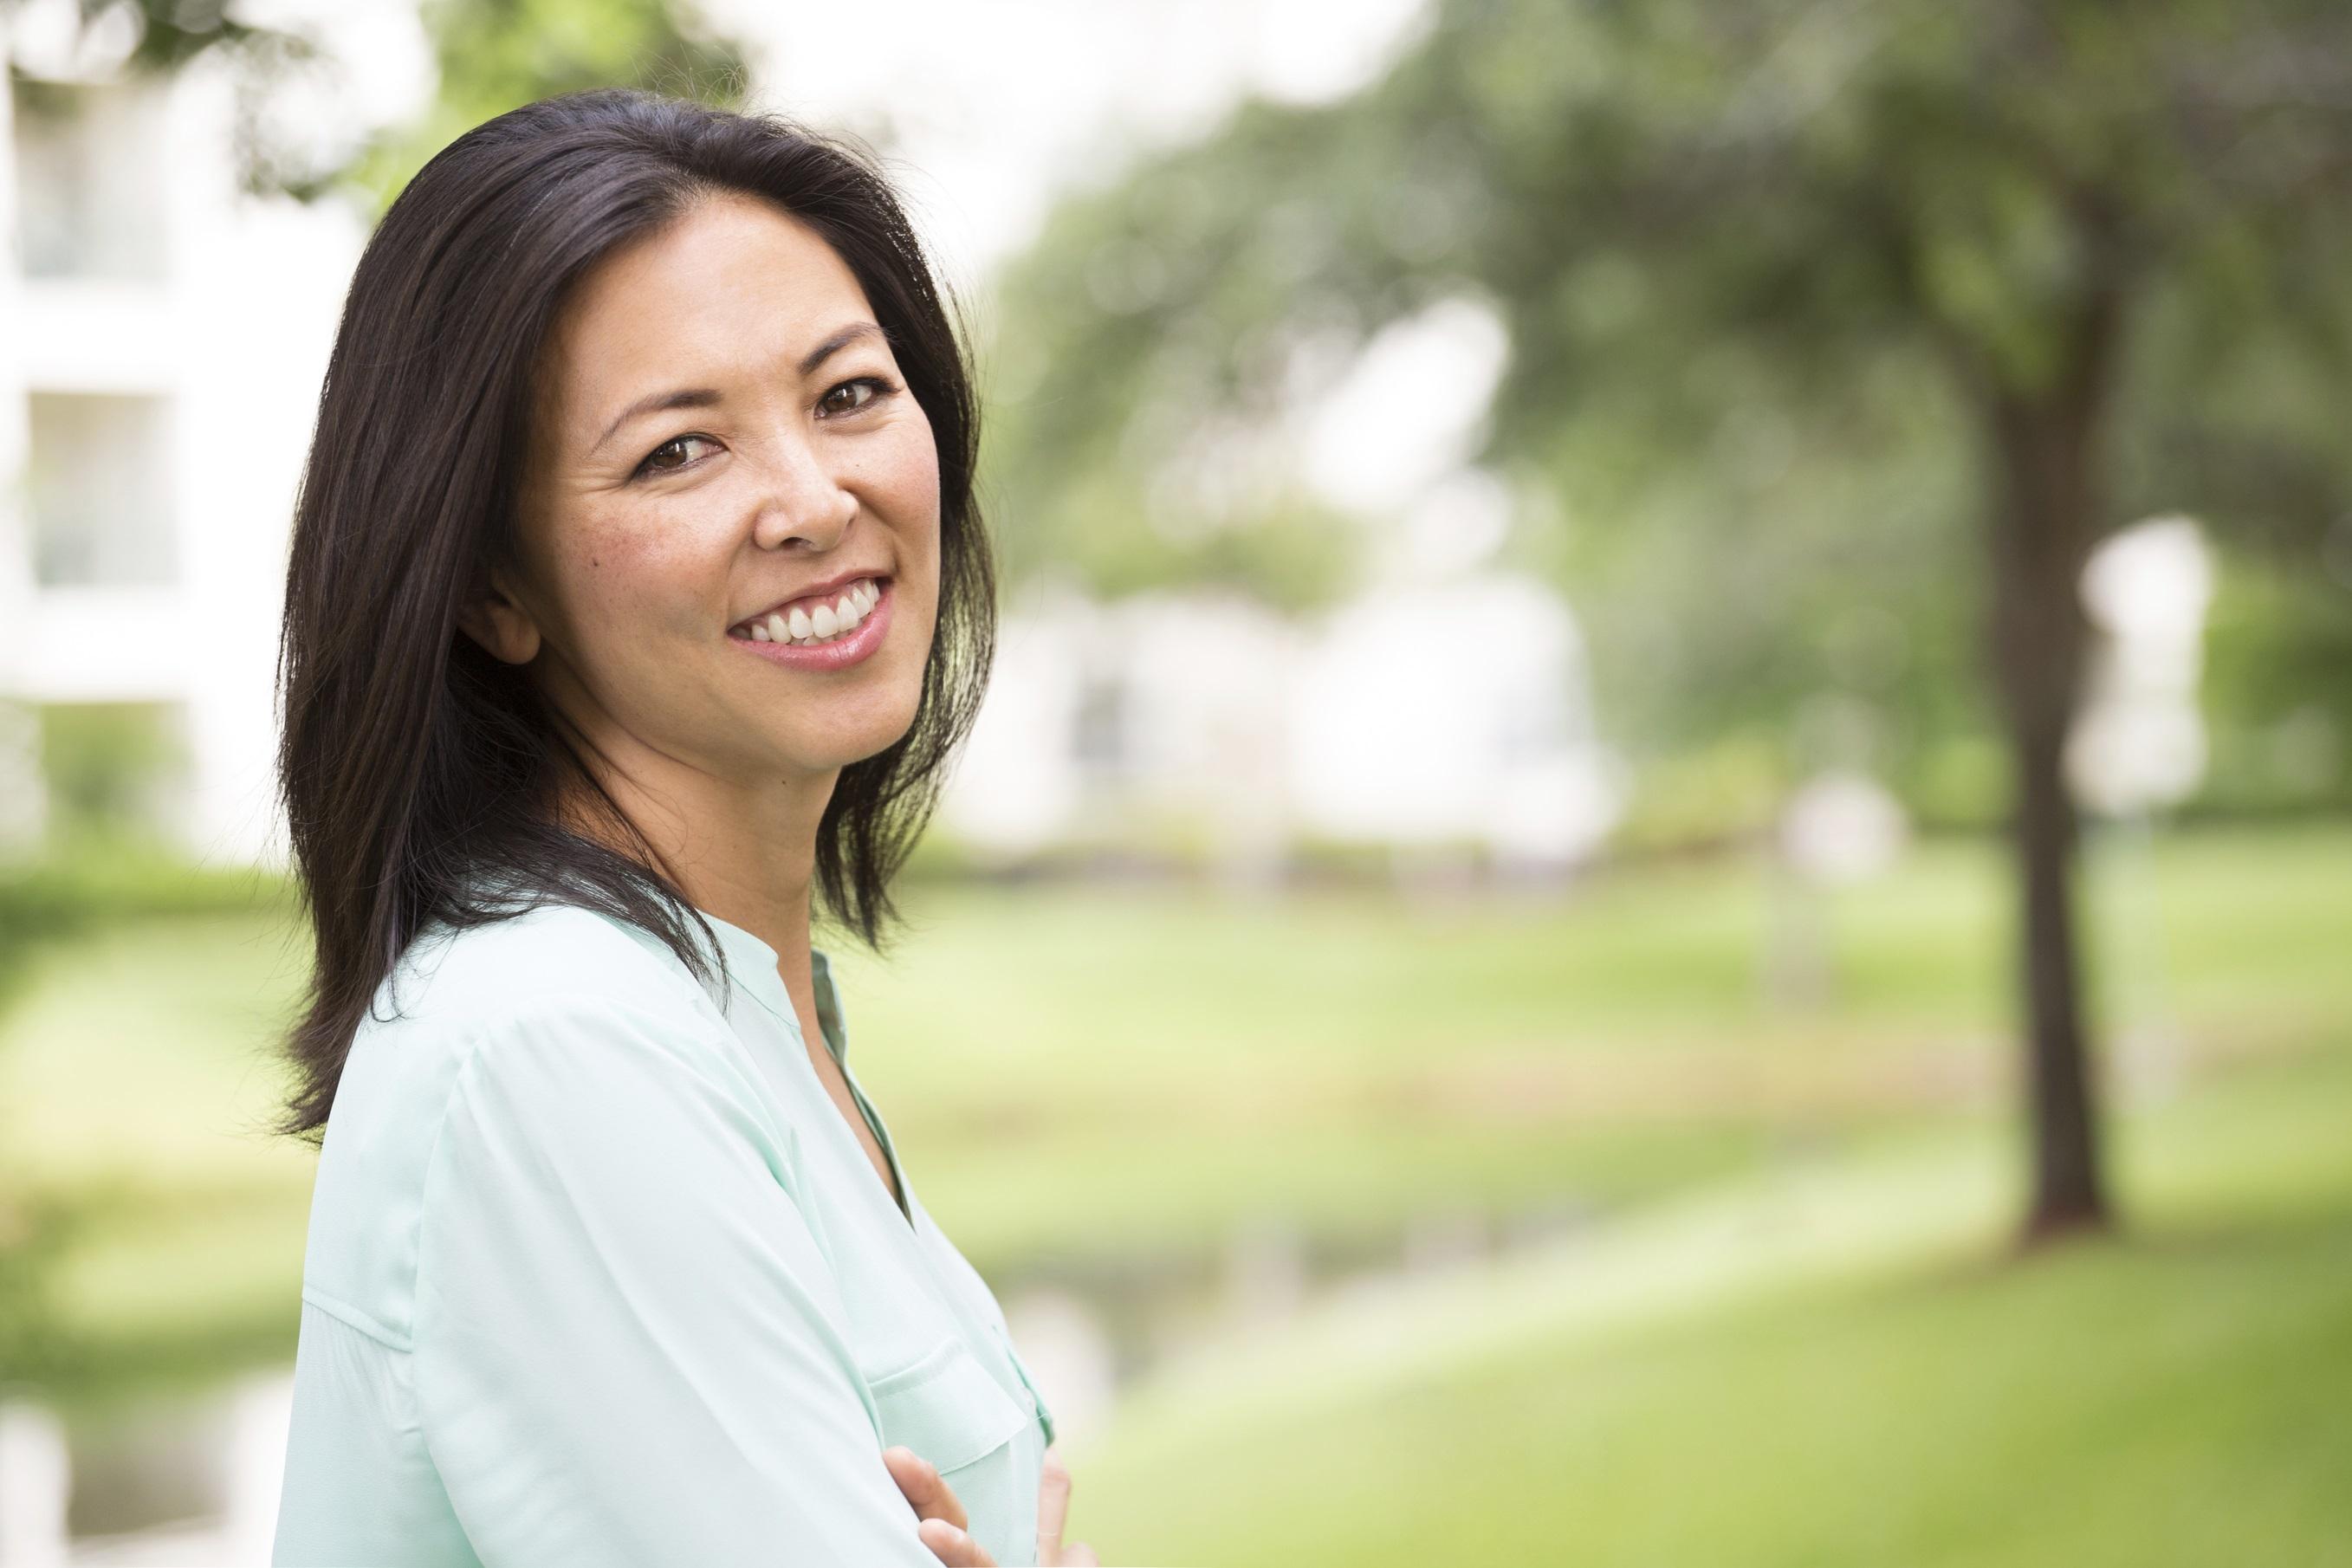 Premature Menopause Snapshot